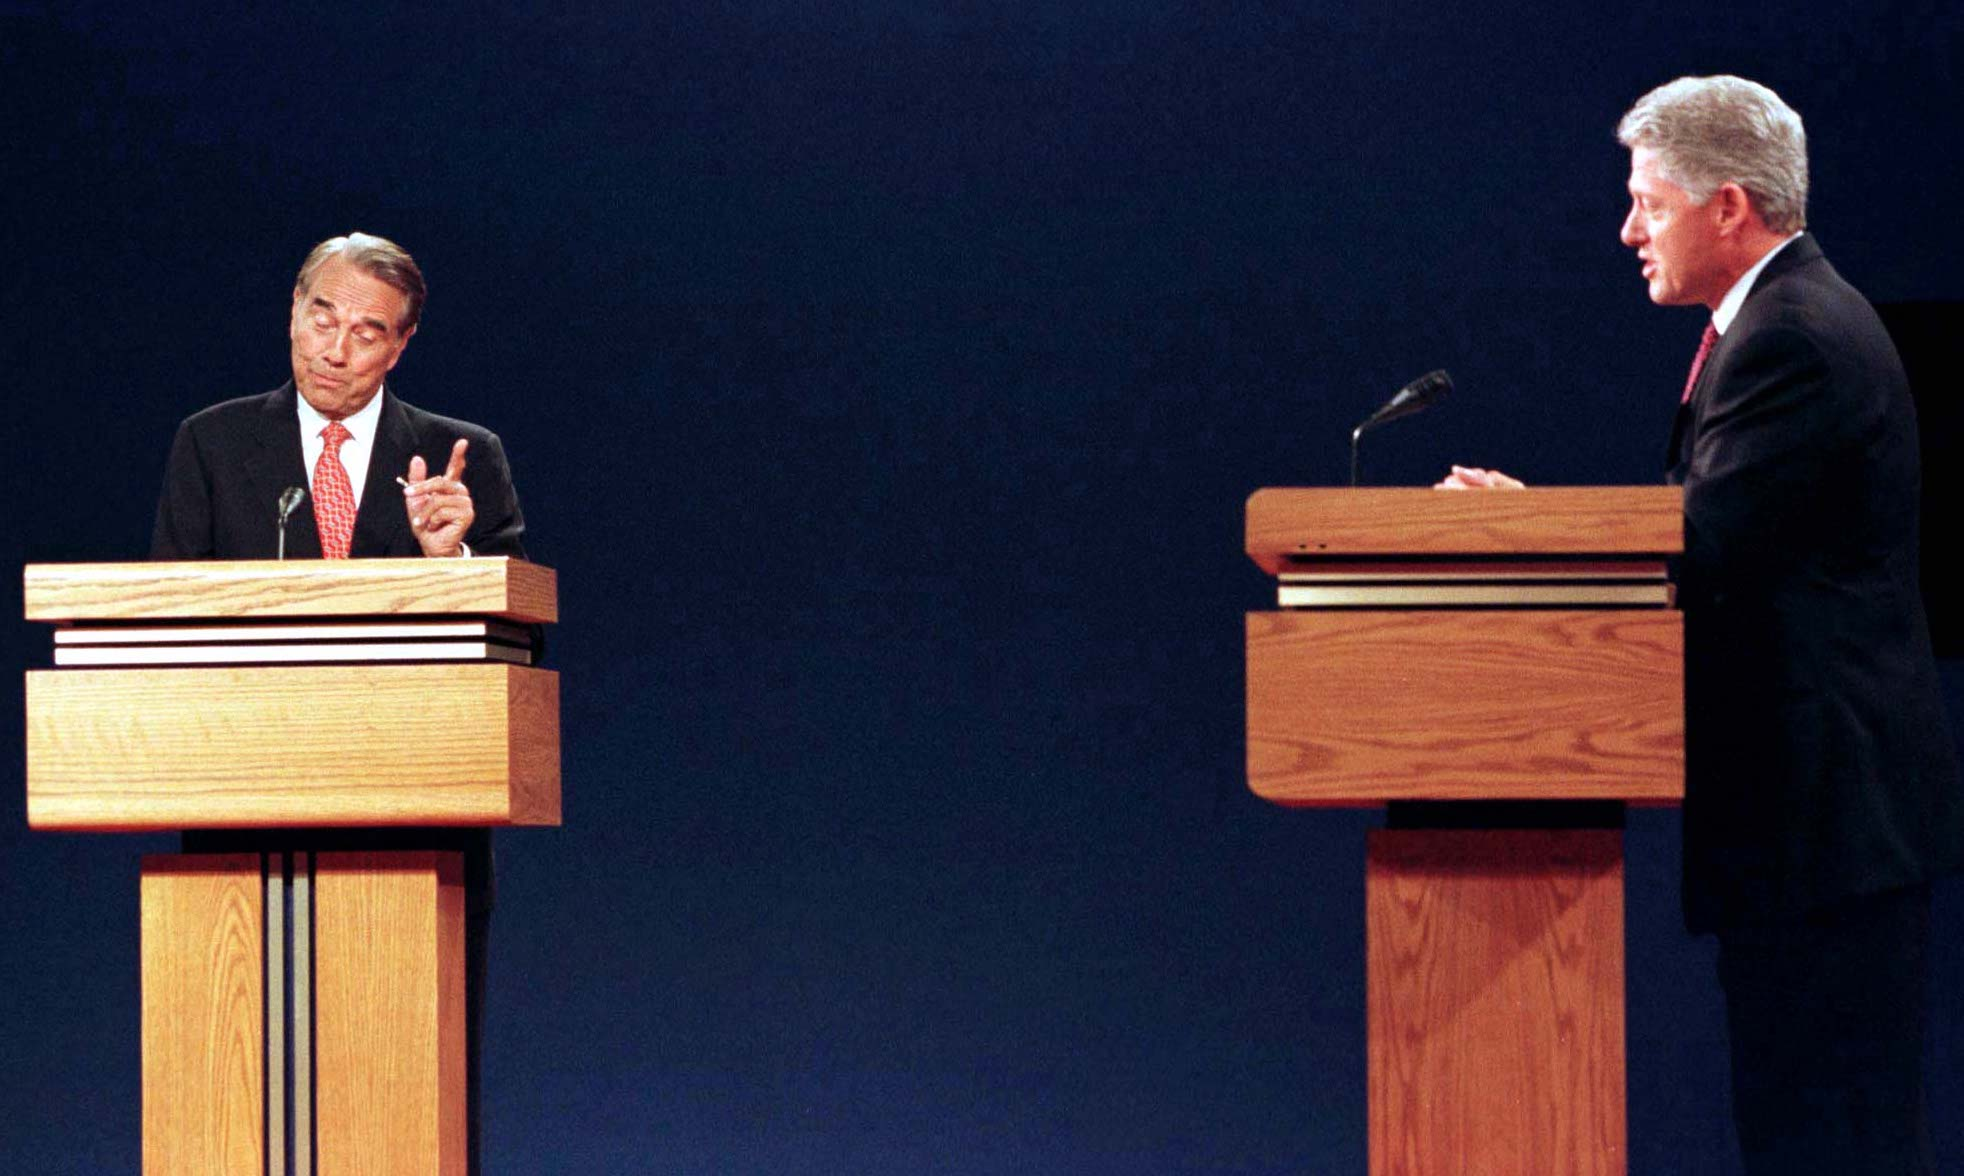 Clinton vs. Dole: The first 1996 presidential debate